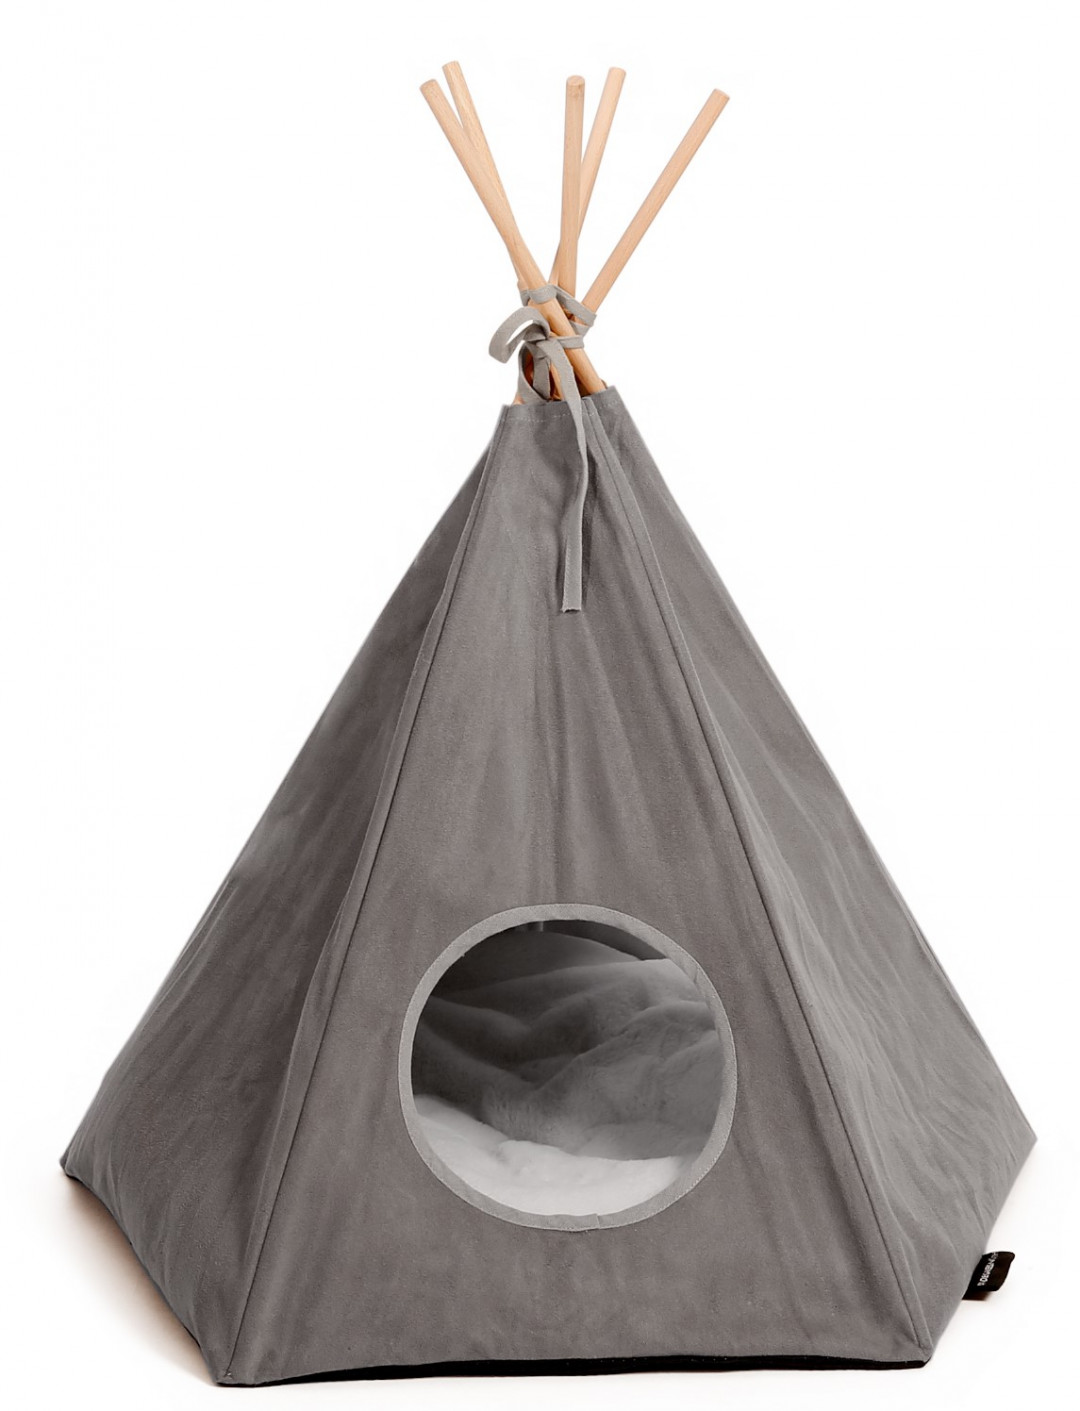 51 Degrees North tipi Inuit grey